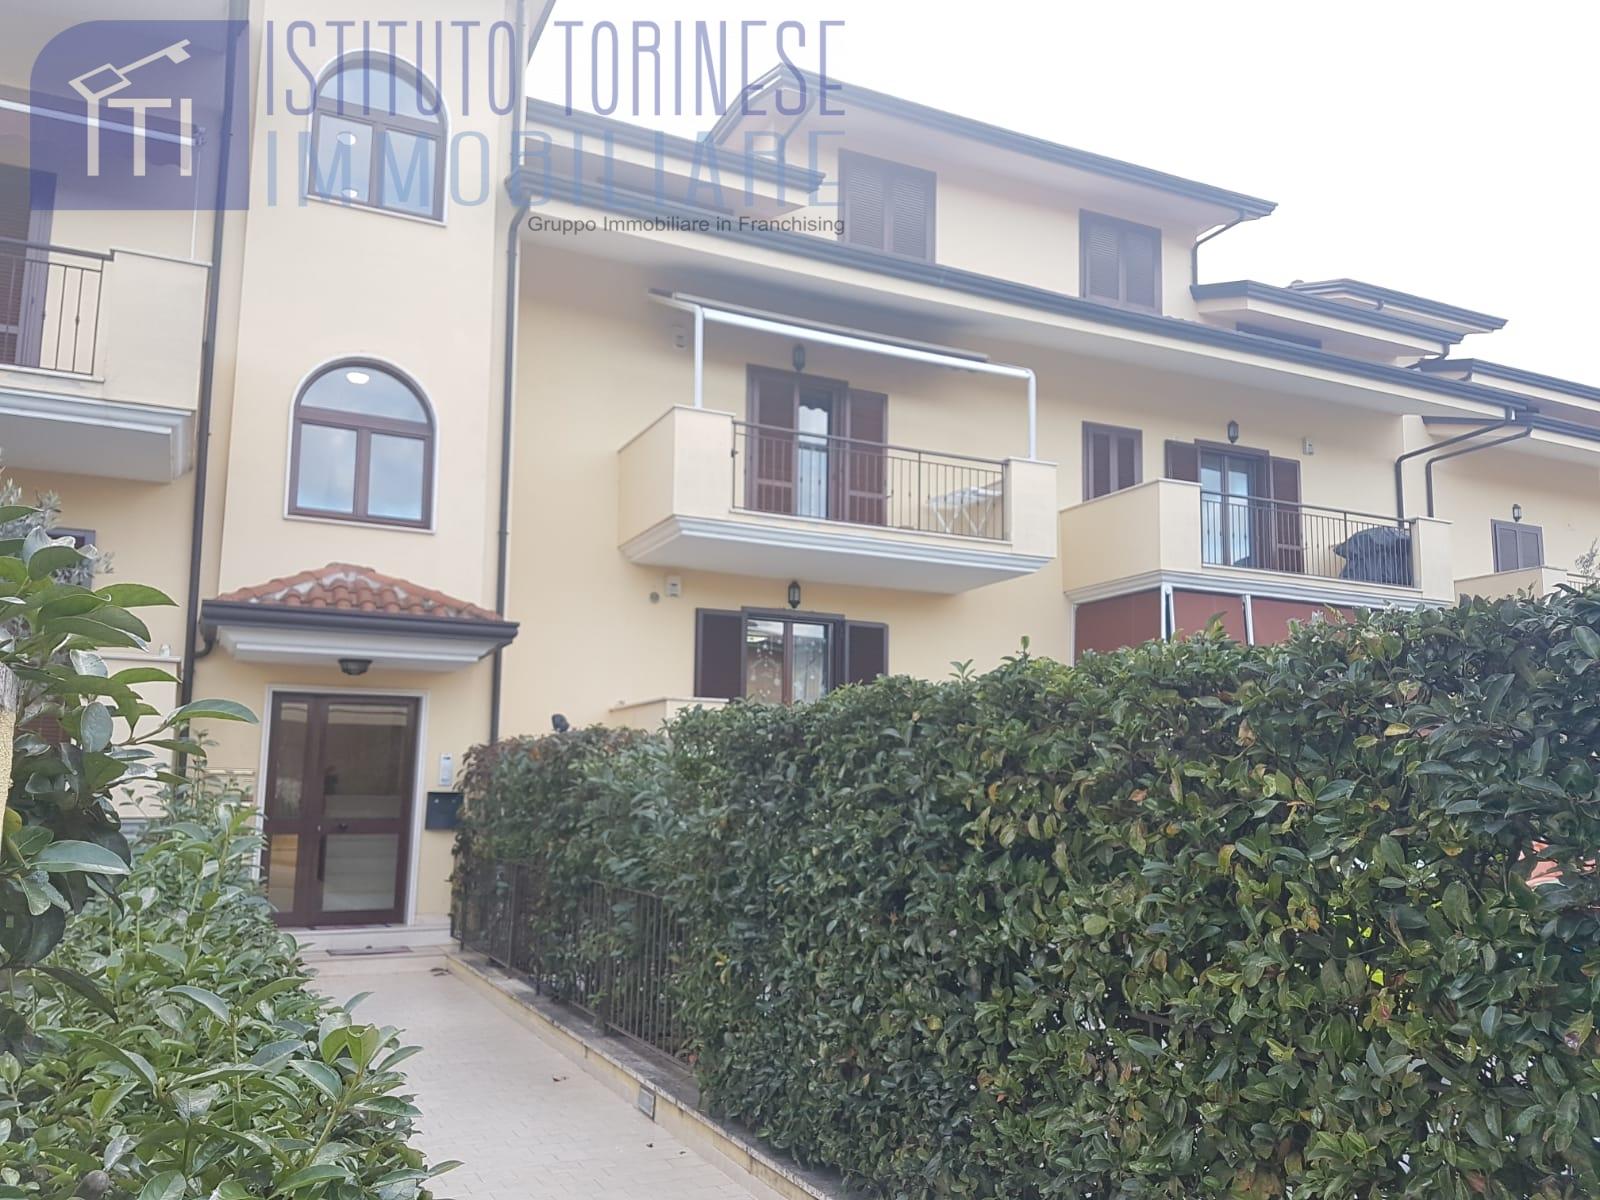 benevento vendita quart: contrade istituto-torinese-immobiliare